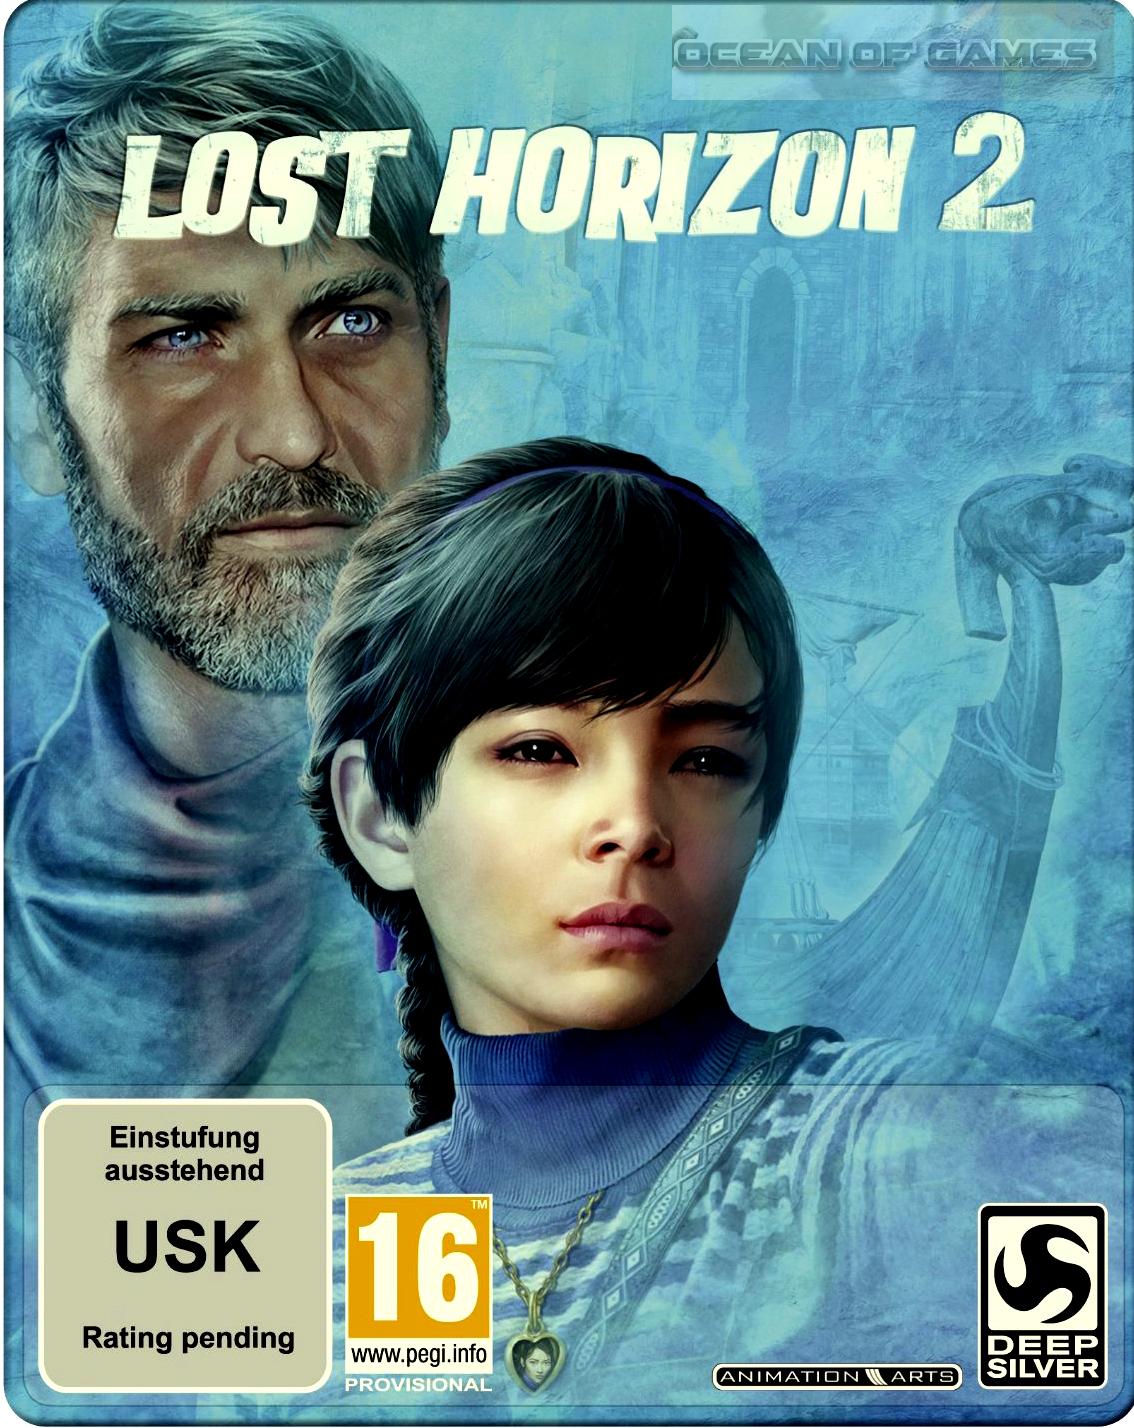 Lost Horizon 2 Free Download